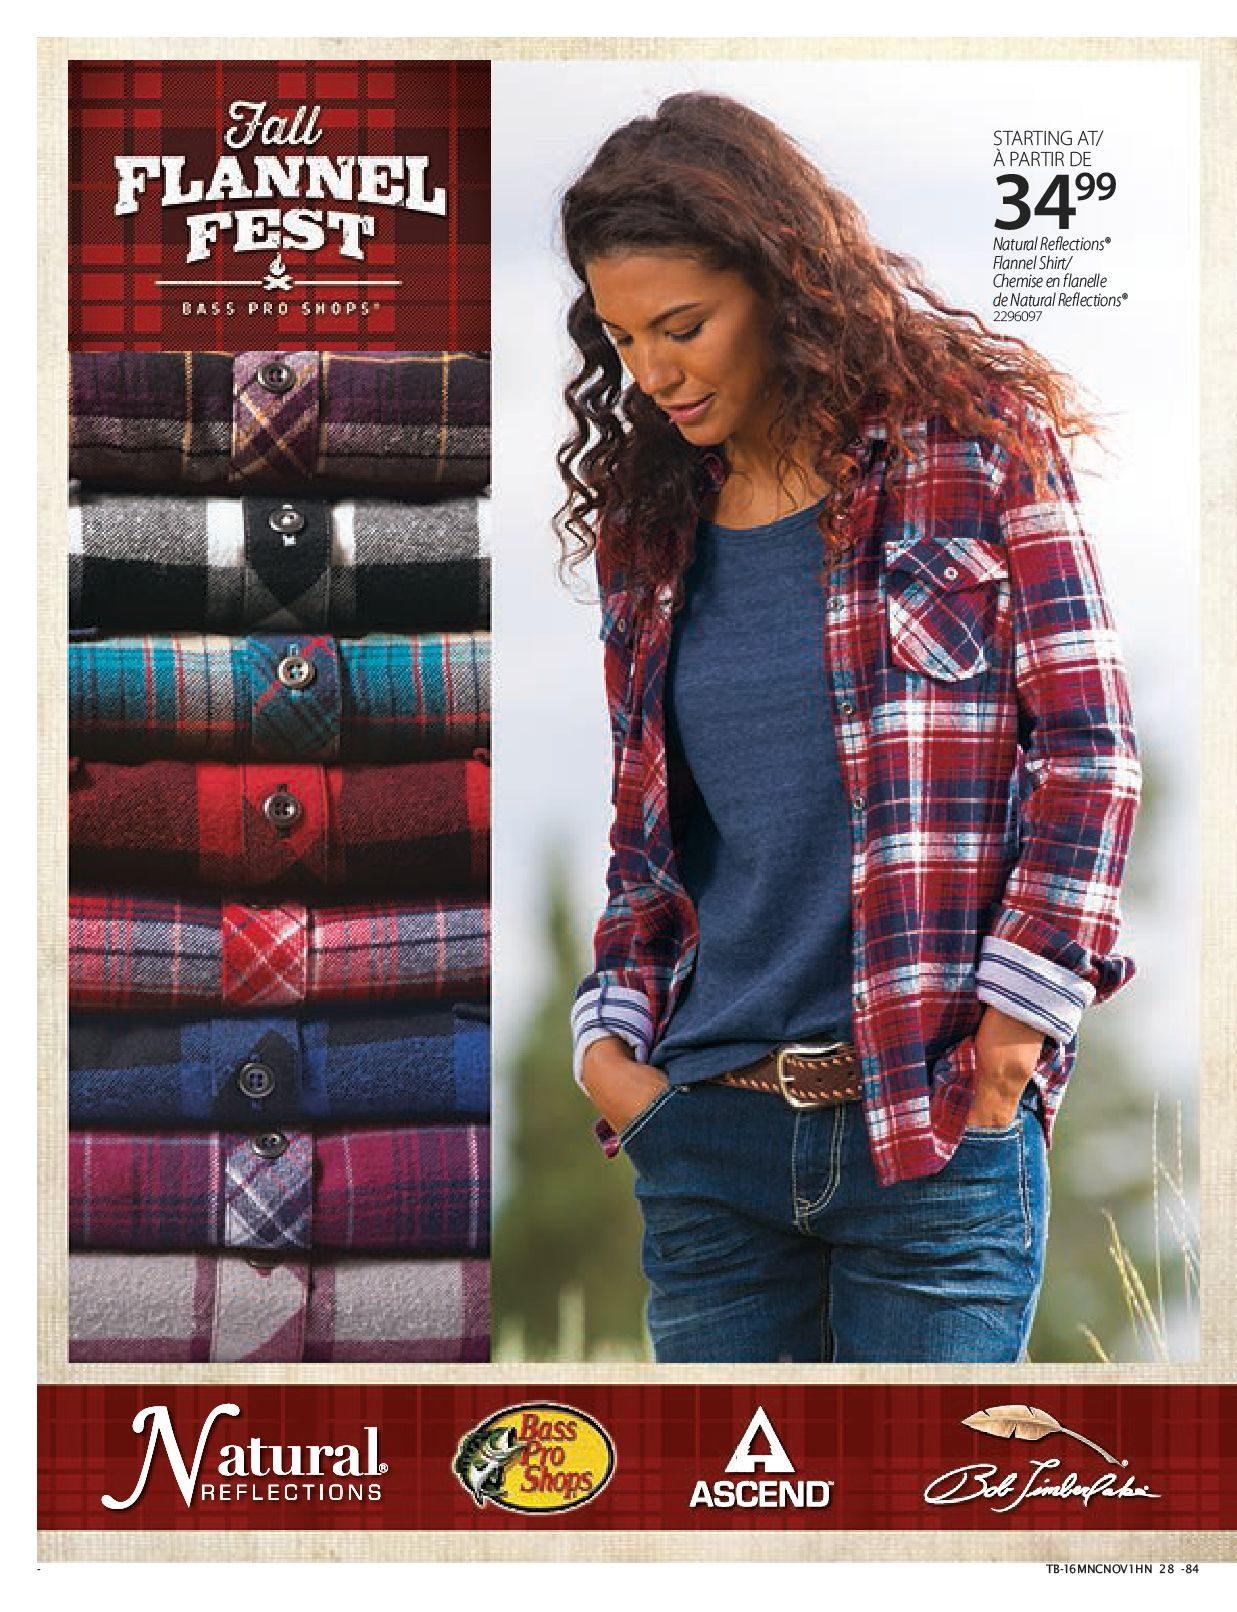 ddc8da7c157 Bass Pro Shops Weekly Flyer - Fall Harvest Sale! - Oct 21 – Nov 13 -  RedFlagDeals.com